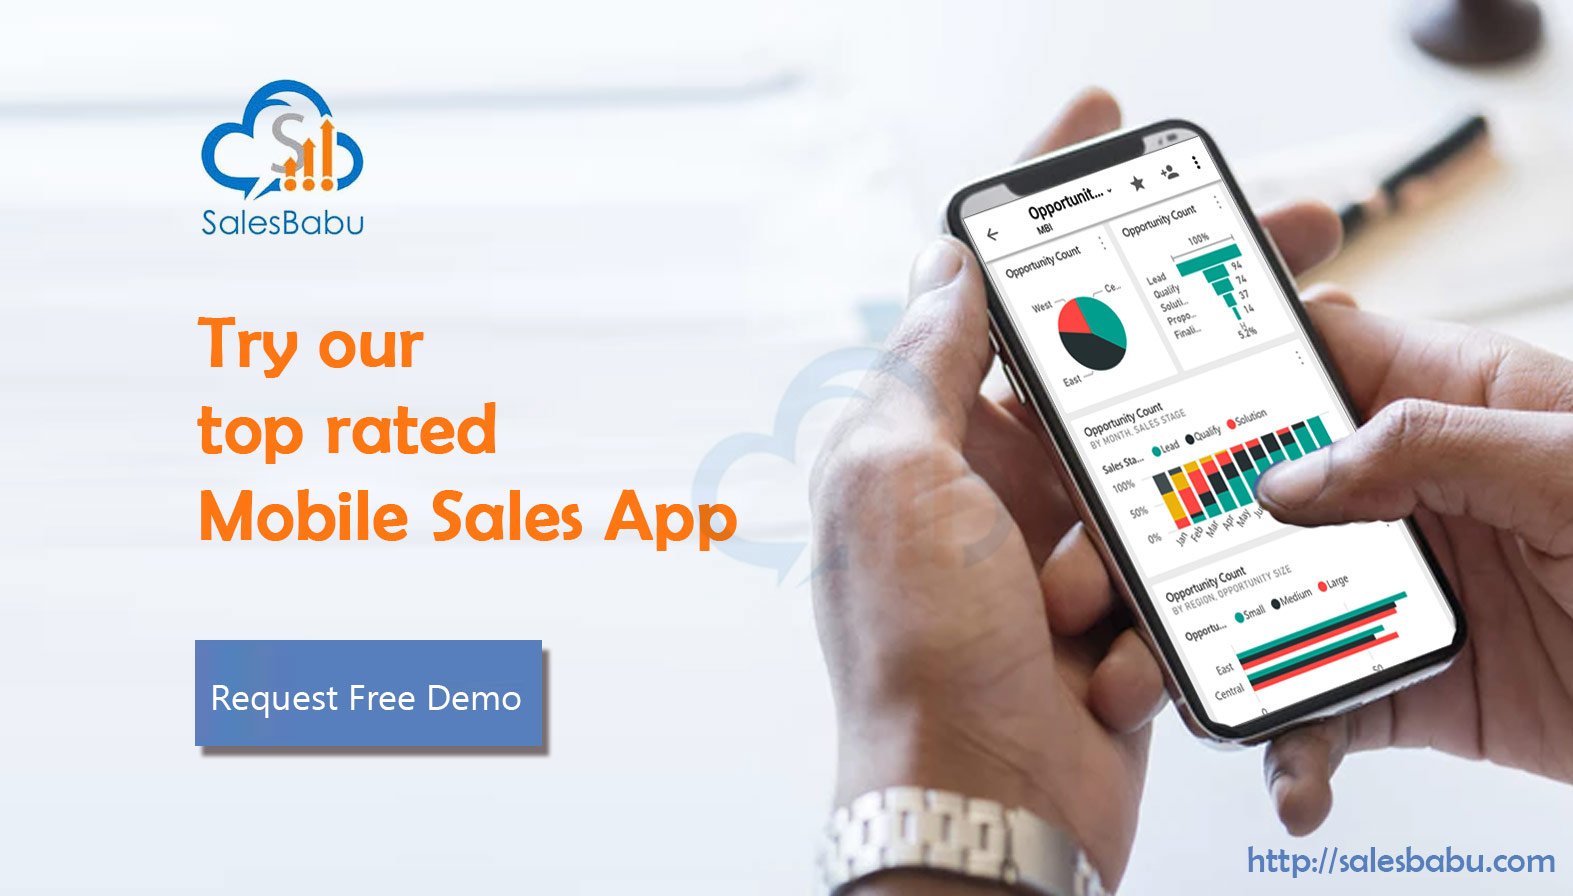 Mobile Sales App : SalesBabu.com